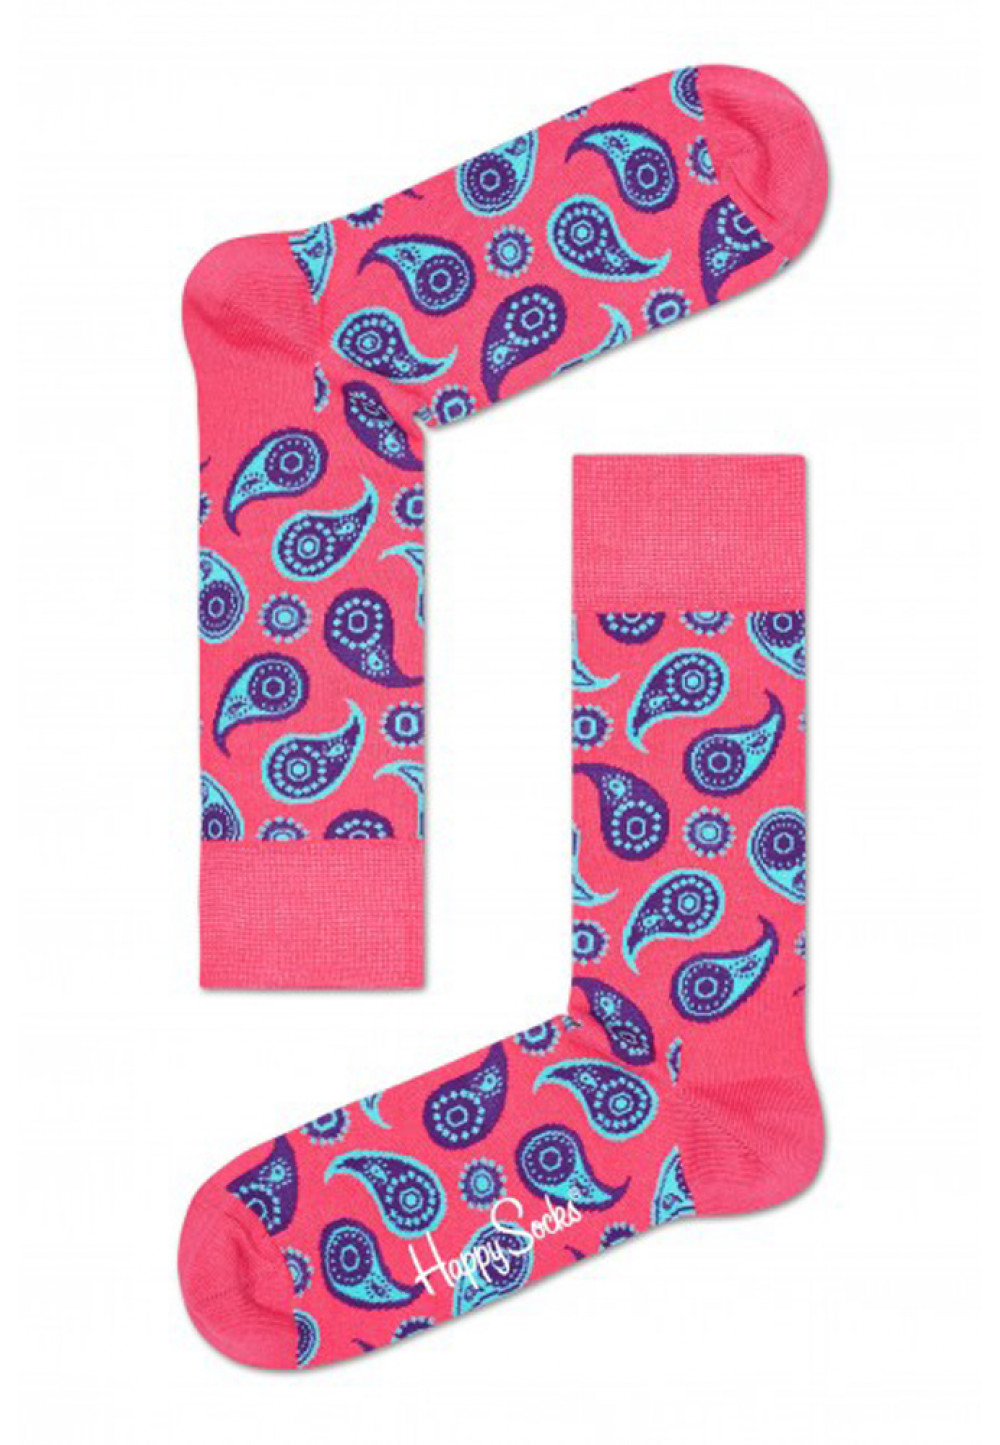 Носки с восточными огурцами